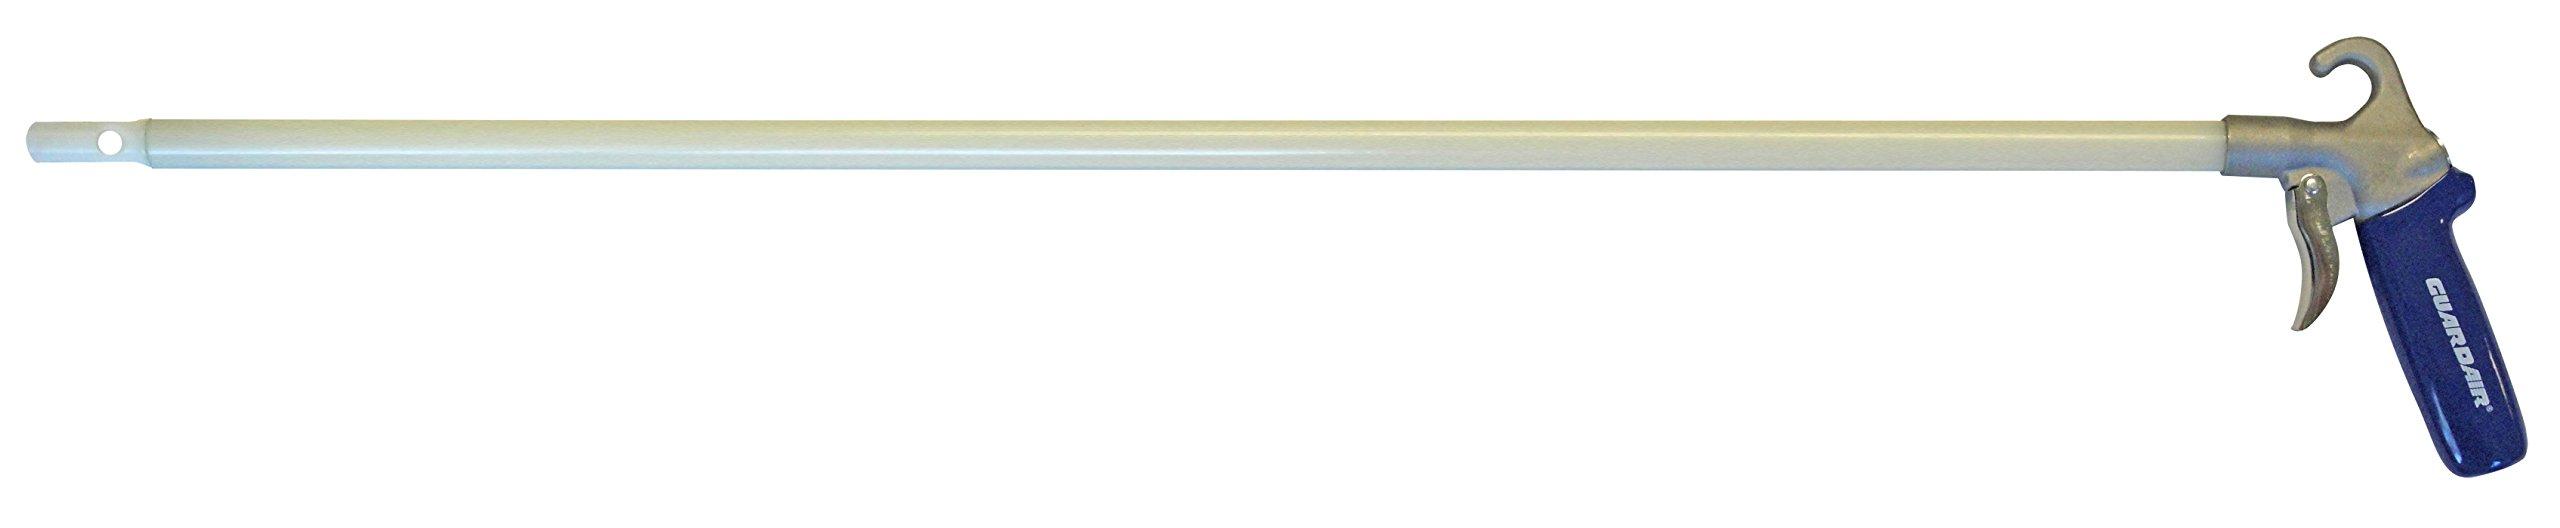 Guardair 75LJ036NN Long John Non-Conductive Safety Air Gun with 36-Inch Nylon Extension and Nylon Nozzle